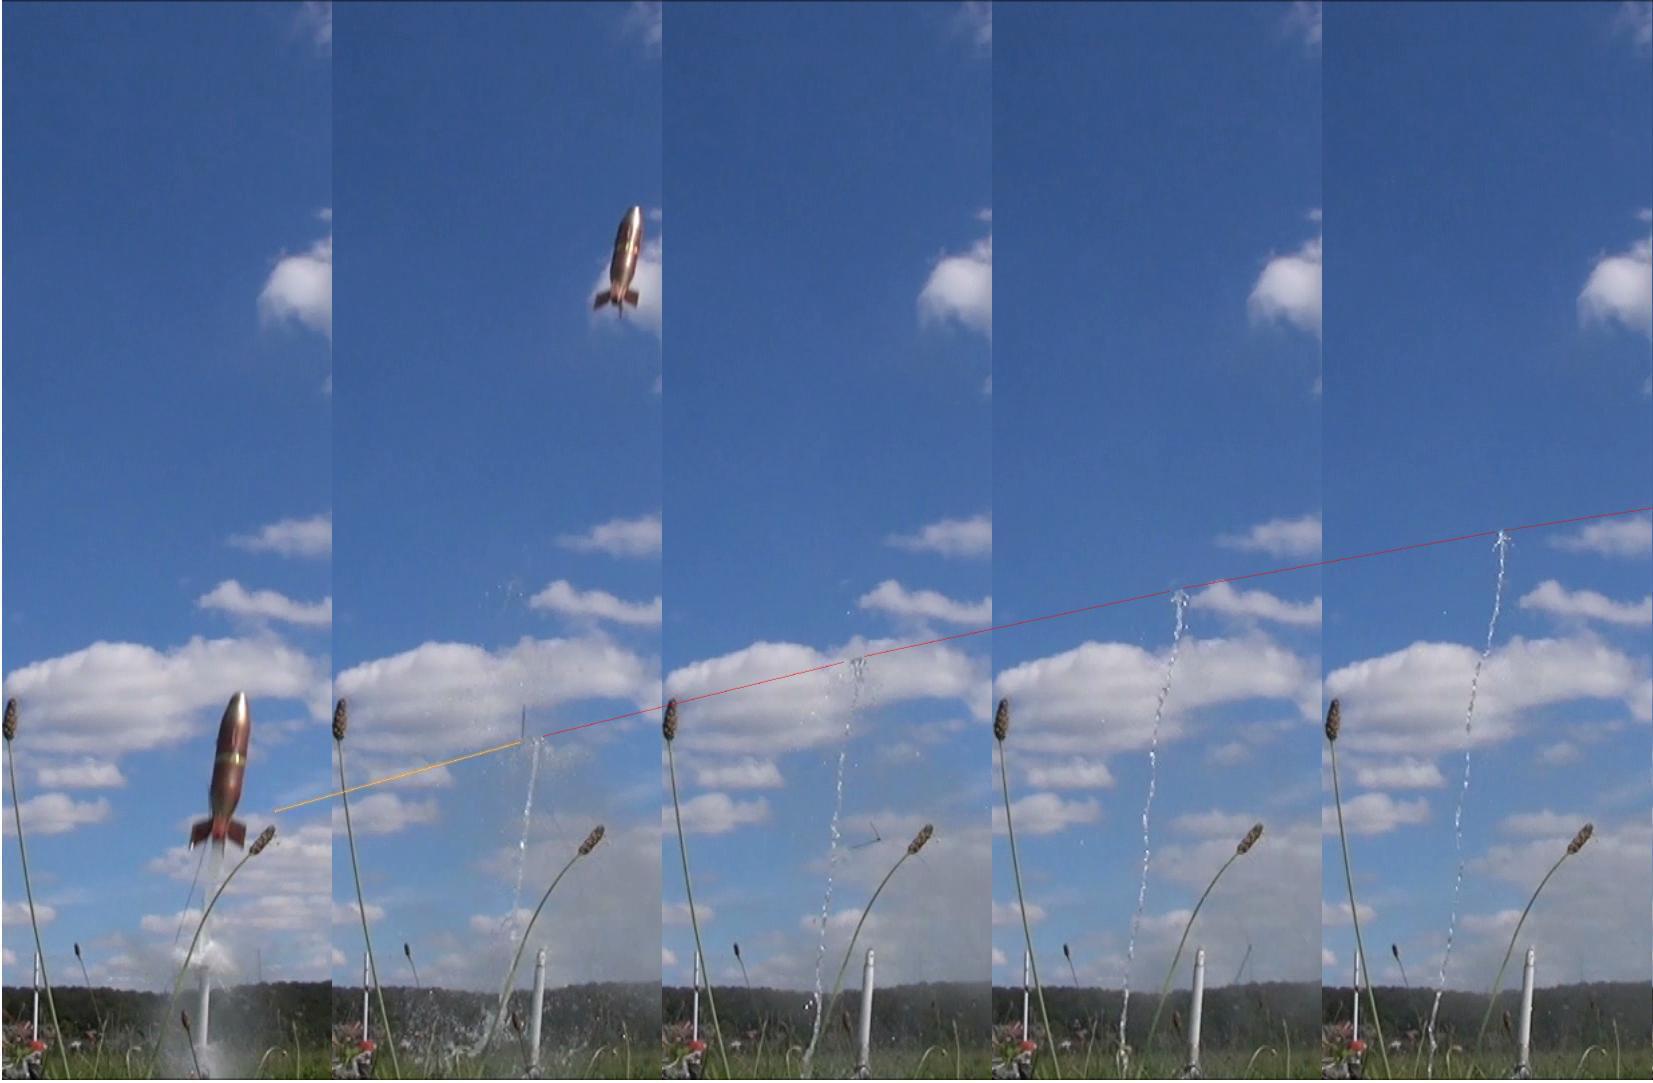 Extrapolation de la fin de propulsion, 5 images